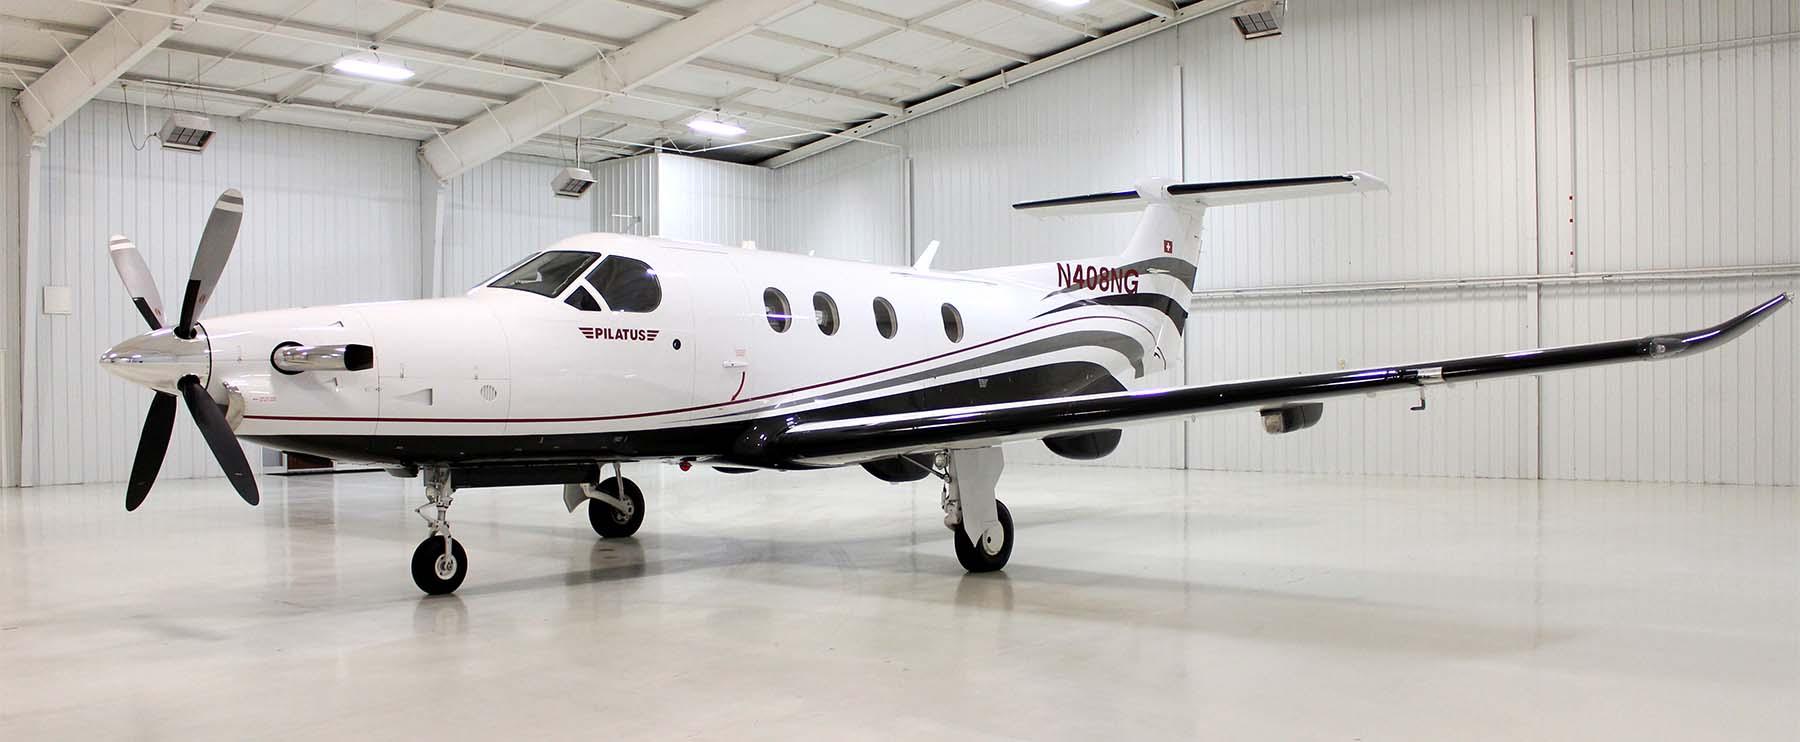 KCAC Aviation